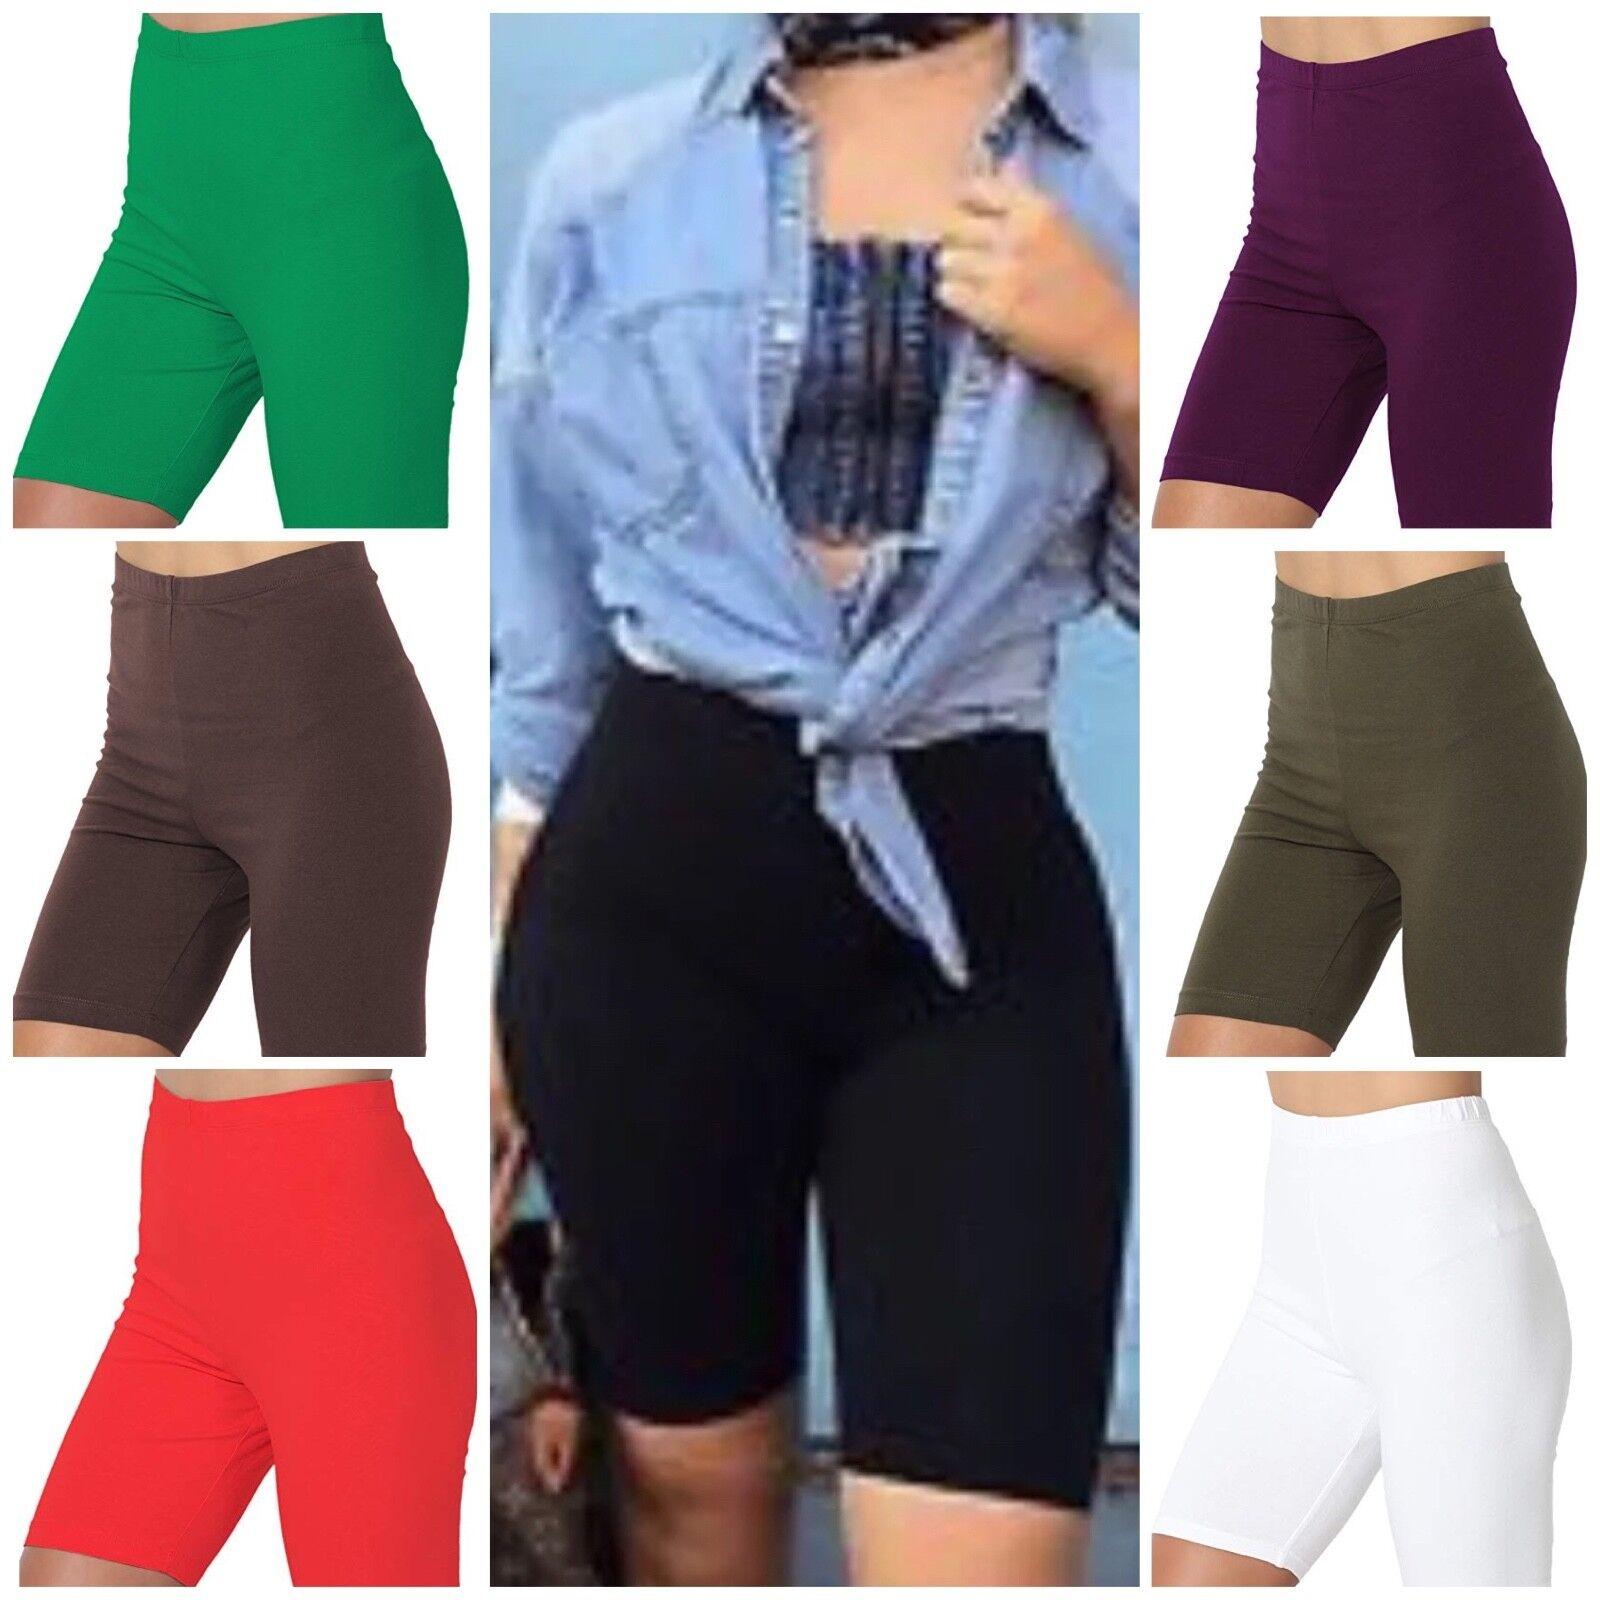 Cotton Spandex Biker Shorts LOT 1-6- 35 Bermuda Women's Plus